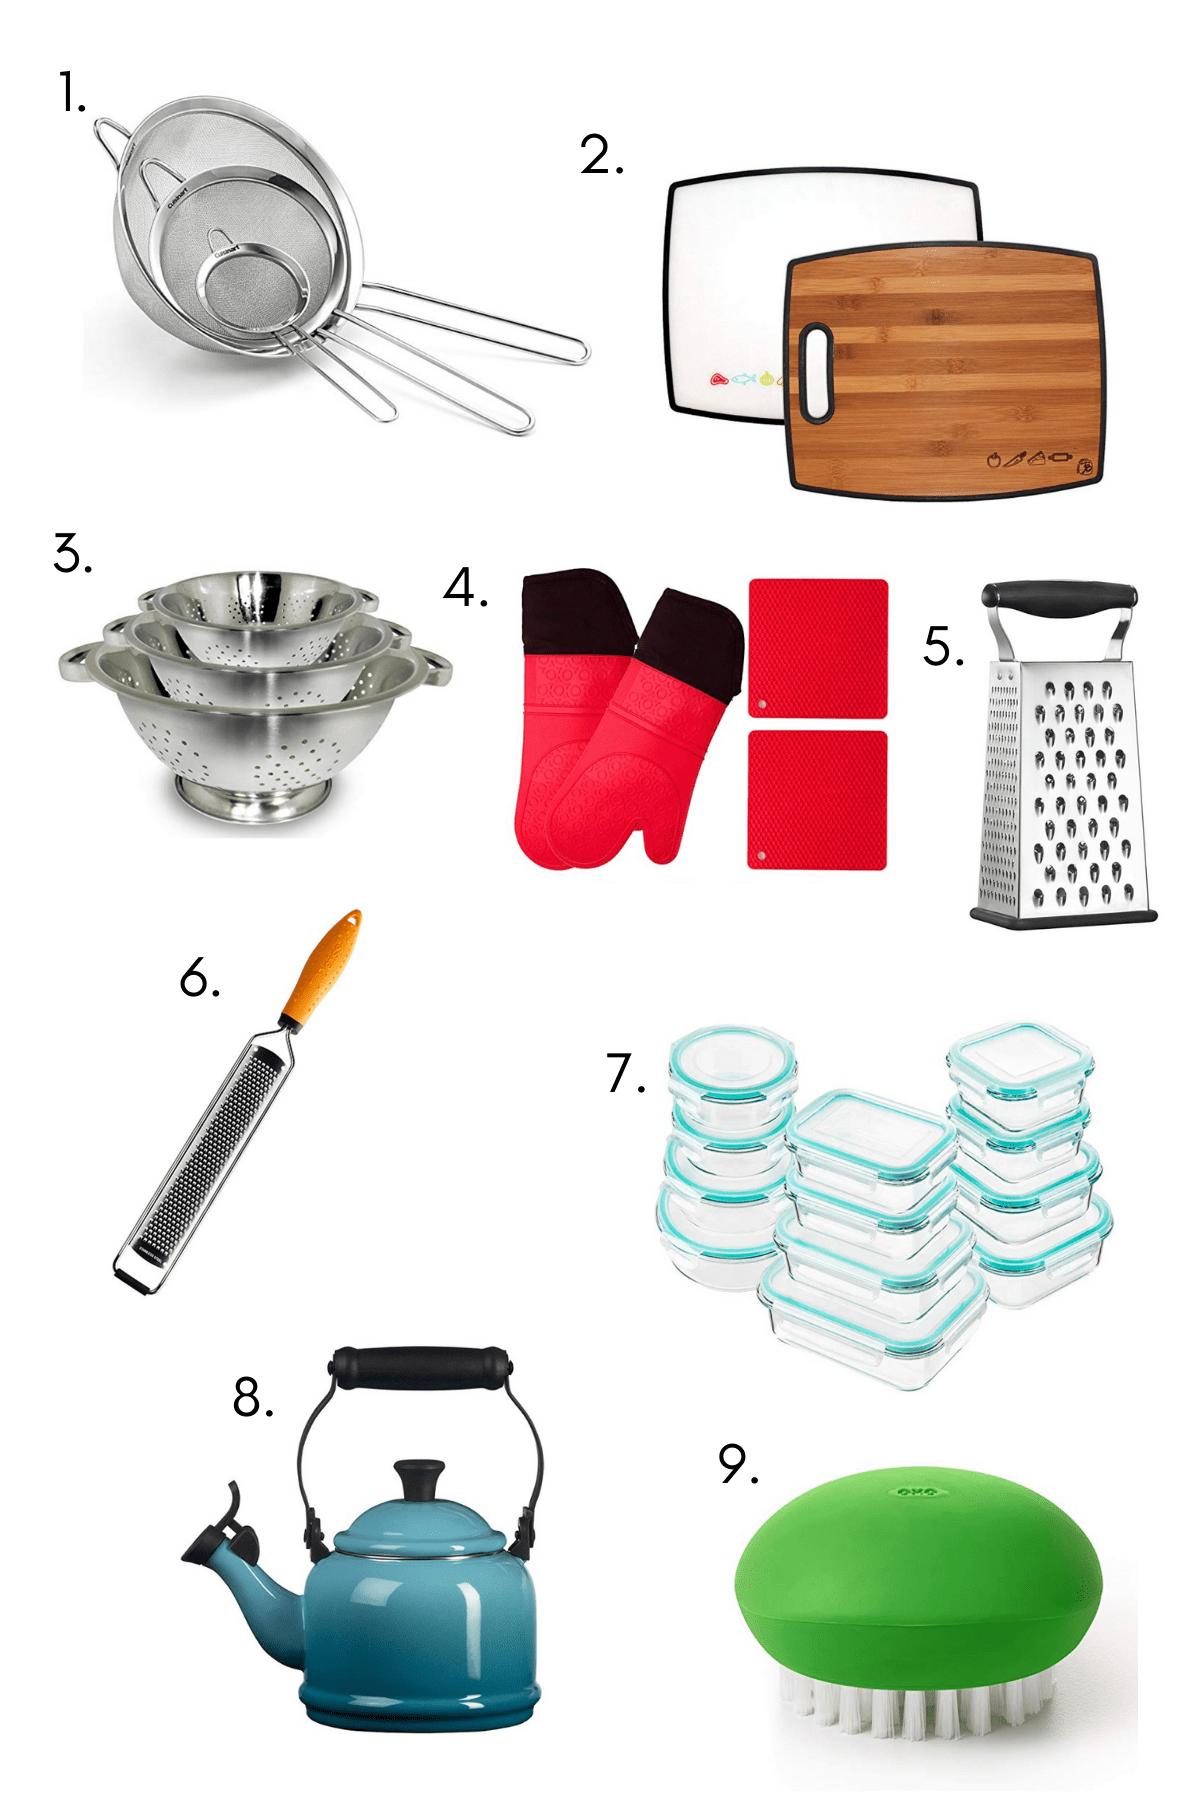 Miscellaneous kitchen essentials image.